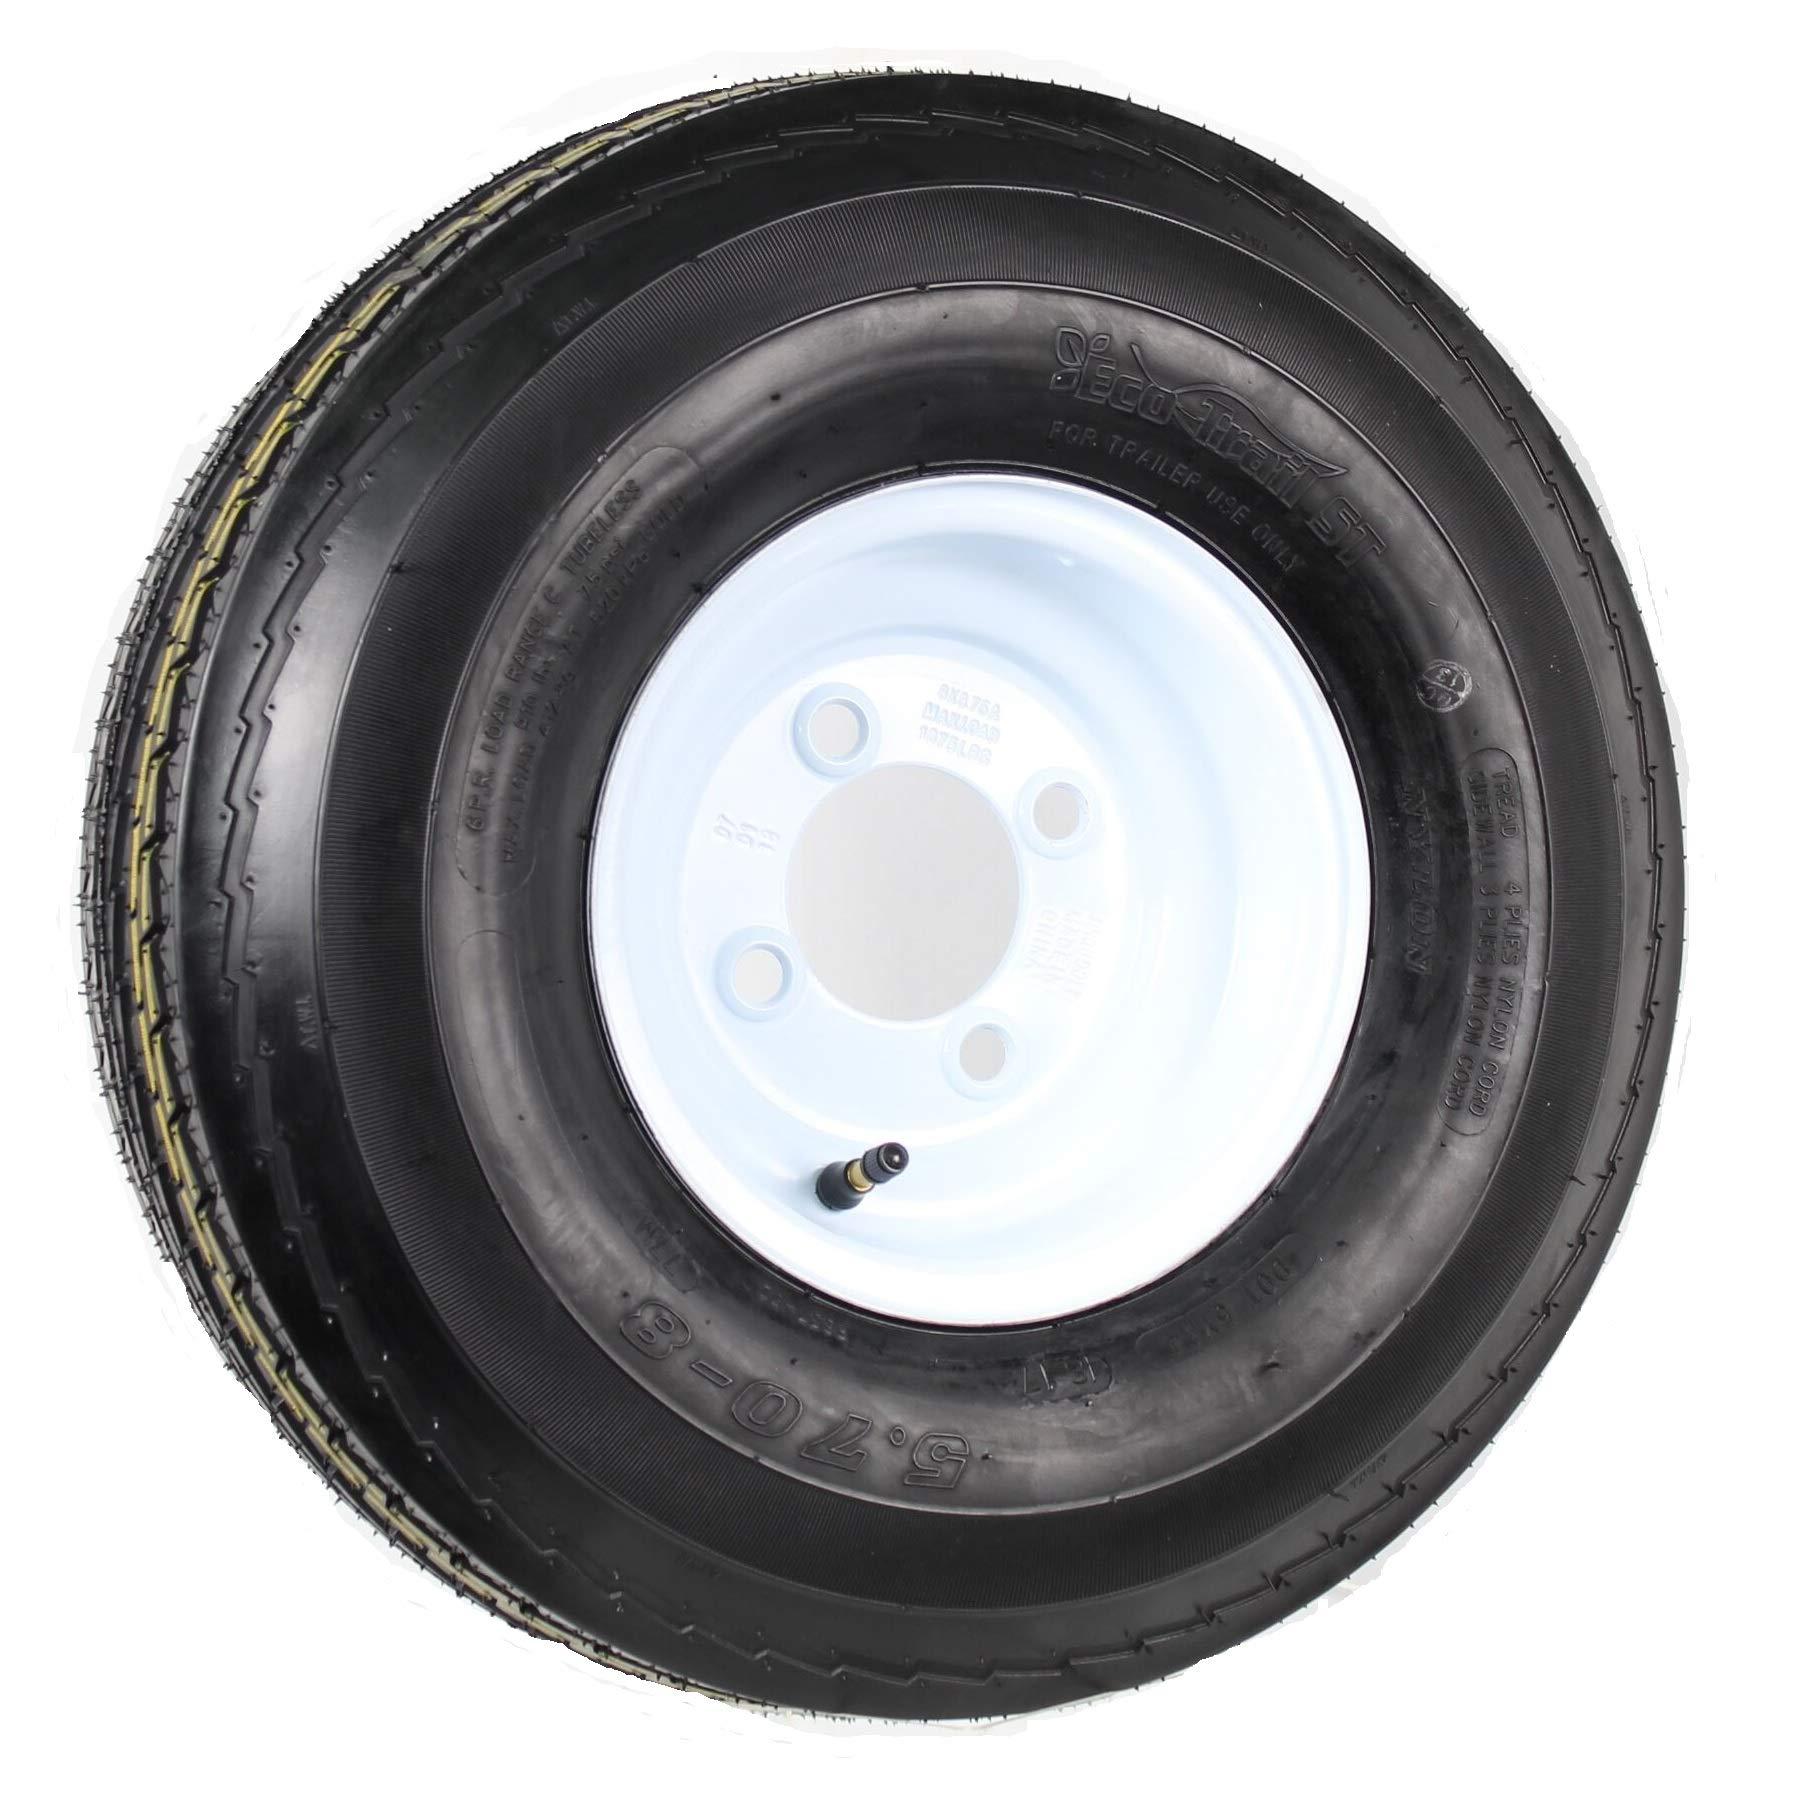 Kenda Loadstar 5.70 X 8 Bias Trailer Tire W/5-Lug Standard White Rim by Loadstar Tires